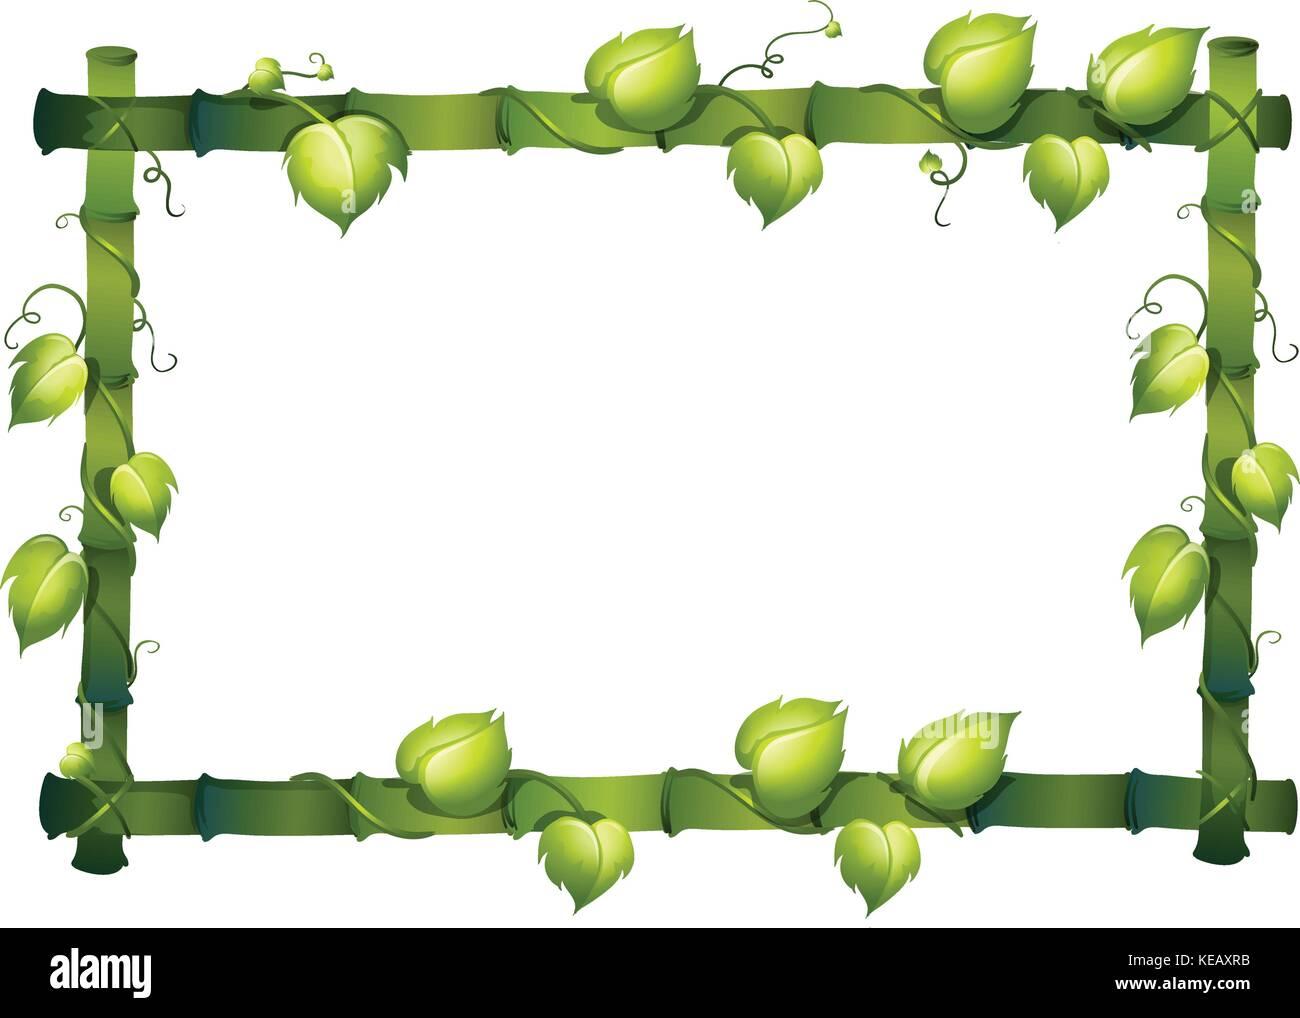 Abbildung: Bambus Rahmen mit Rebe Vektor Abbildung - Bild: 163739055 ...